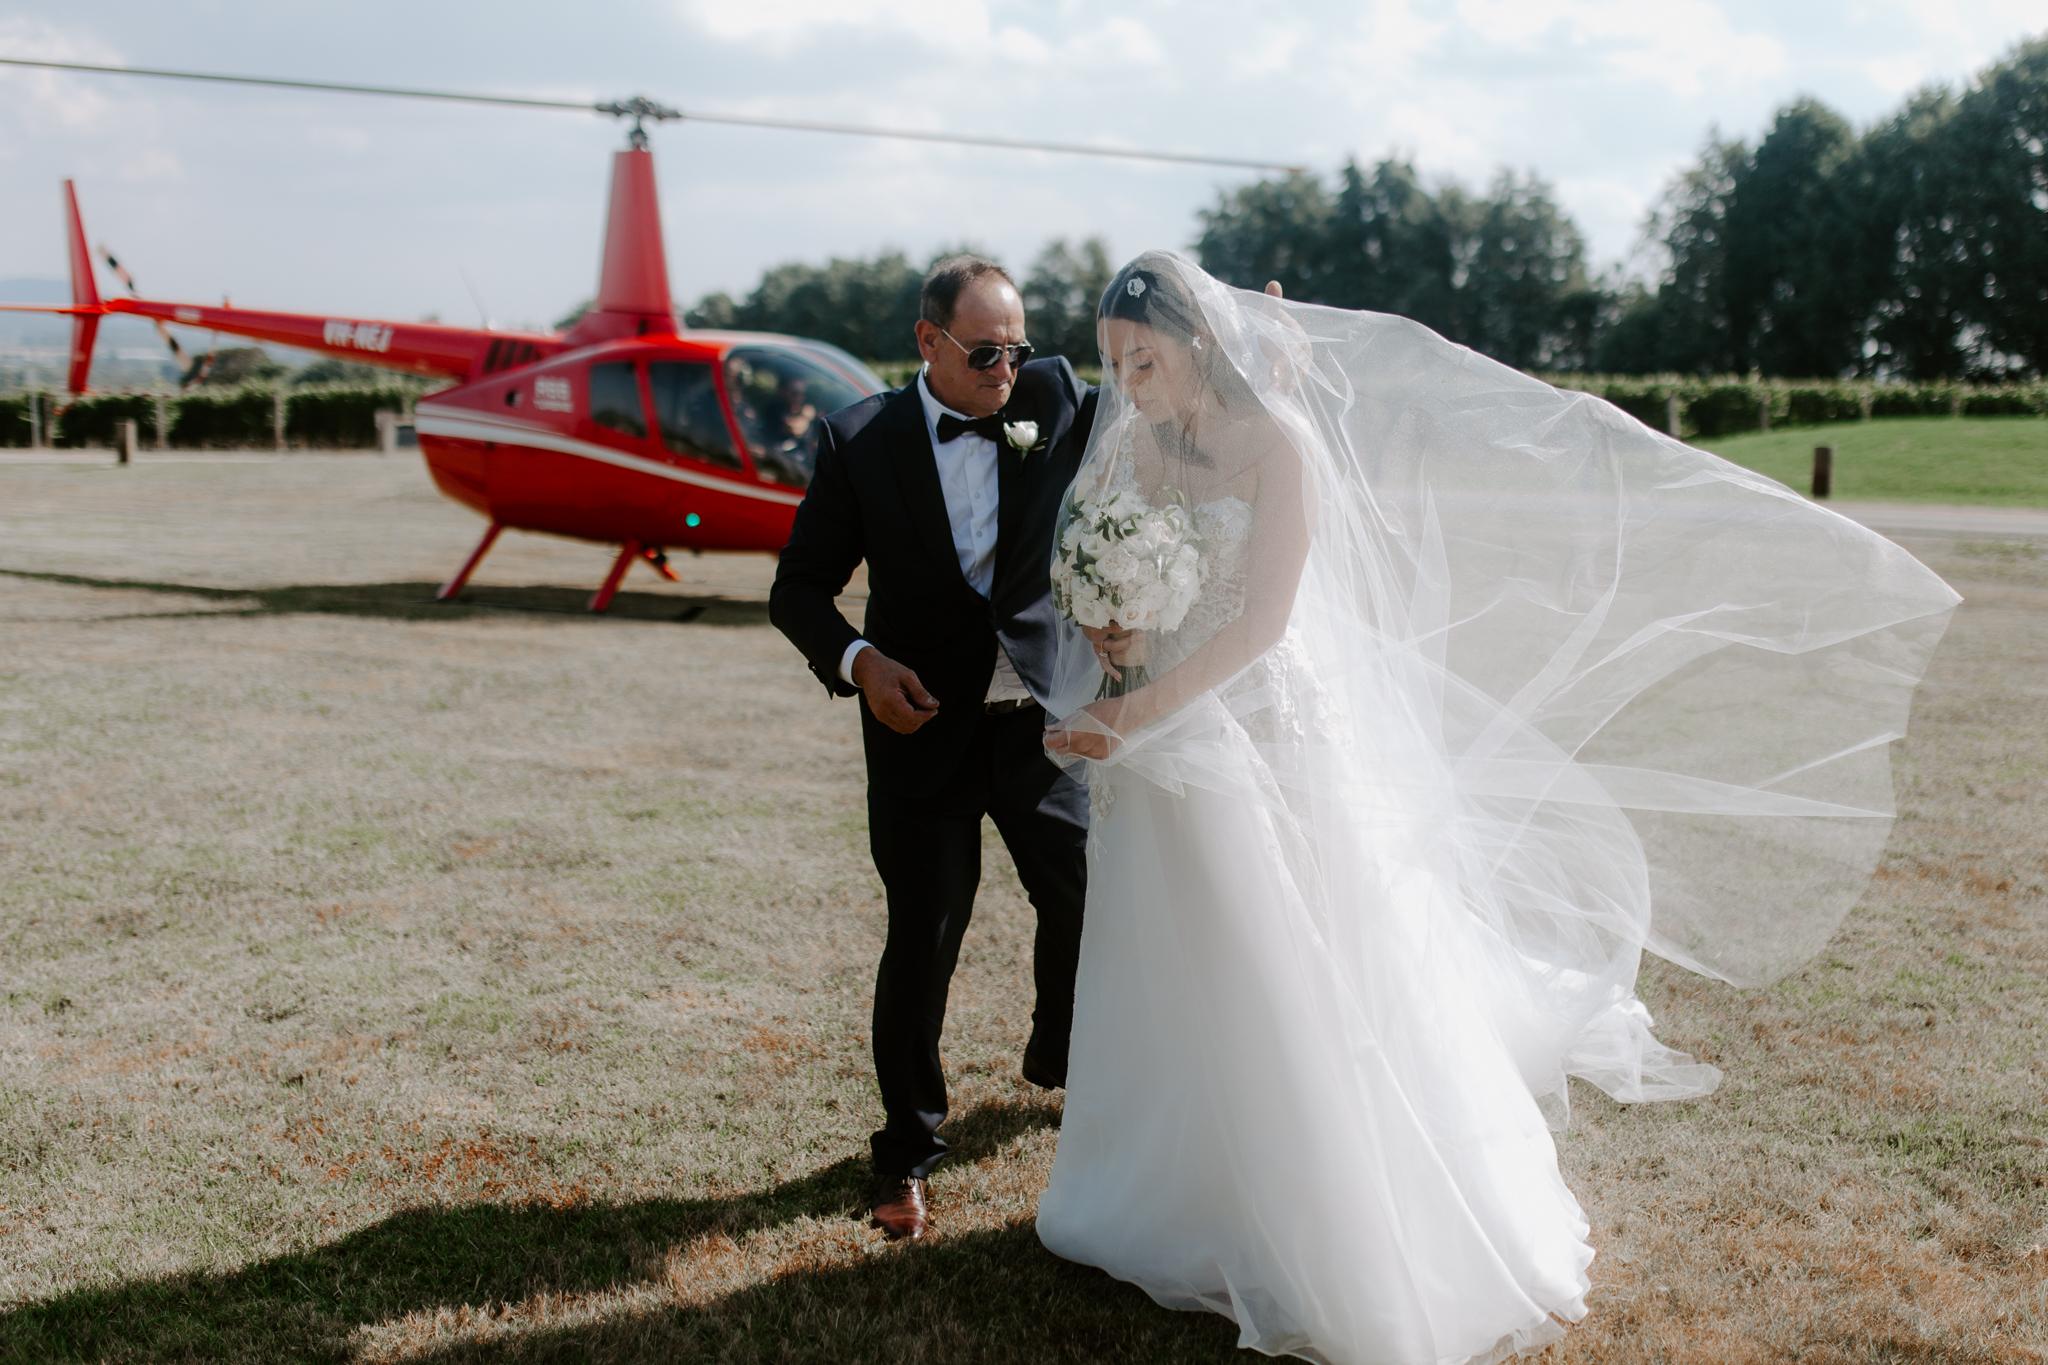 The-Stones-of-Yarra-Valley-Wedding-EmotionsandMathPhotography-099.jpg